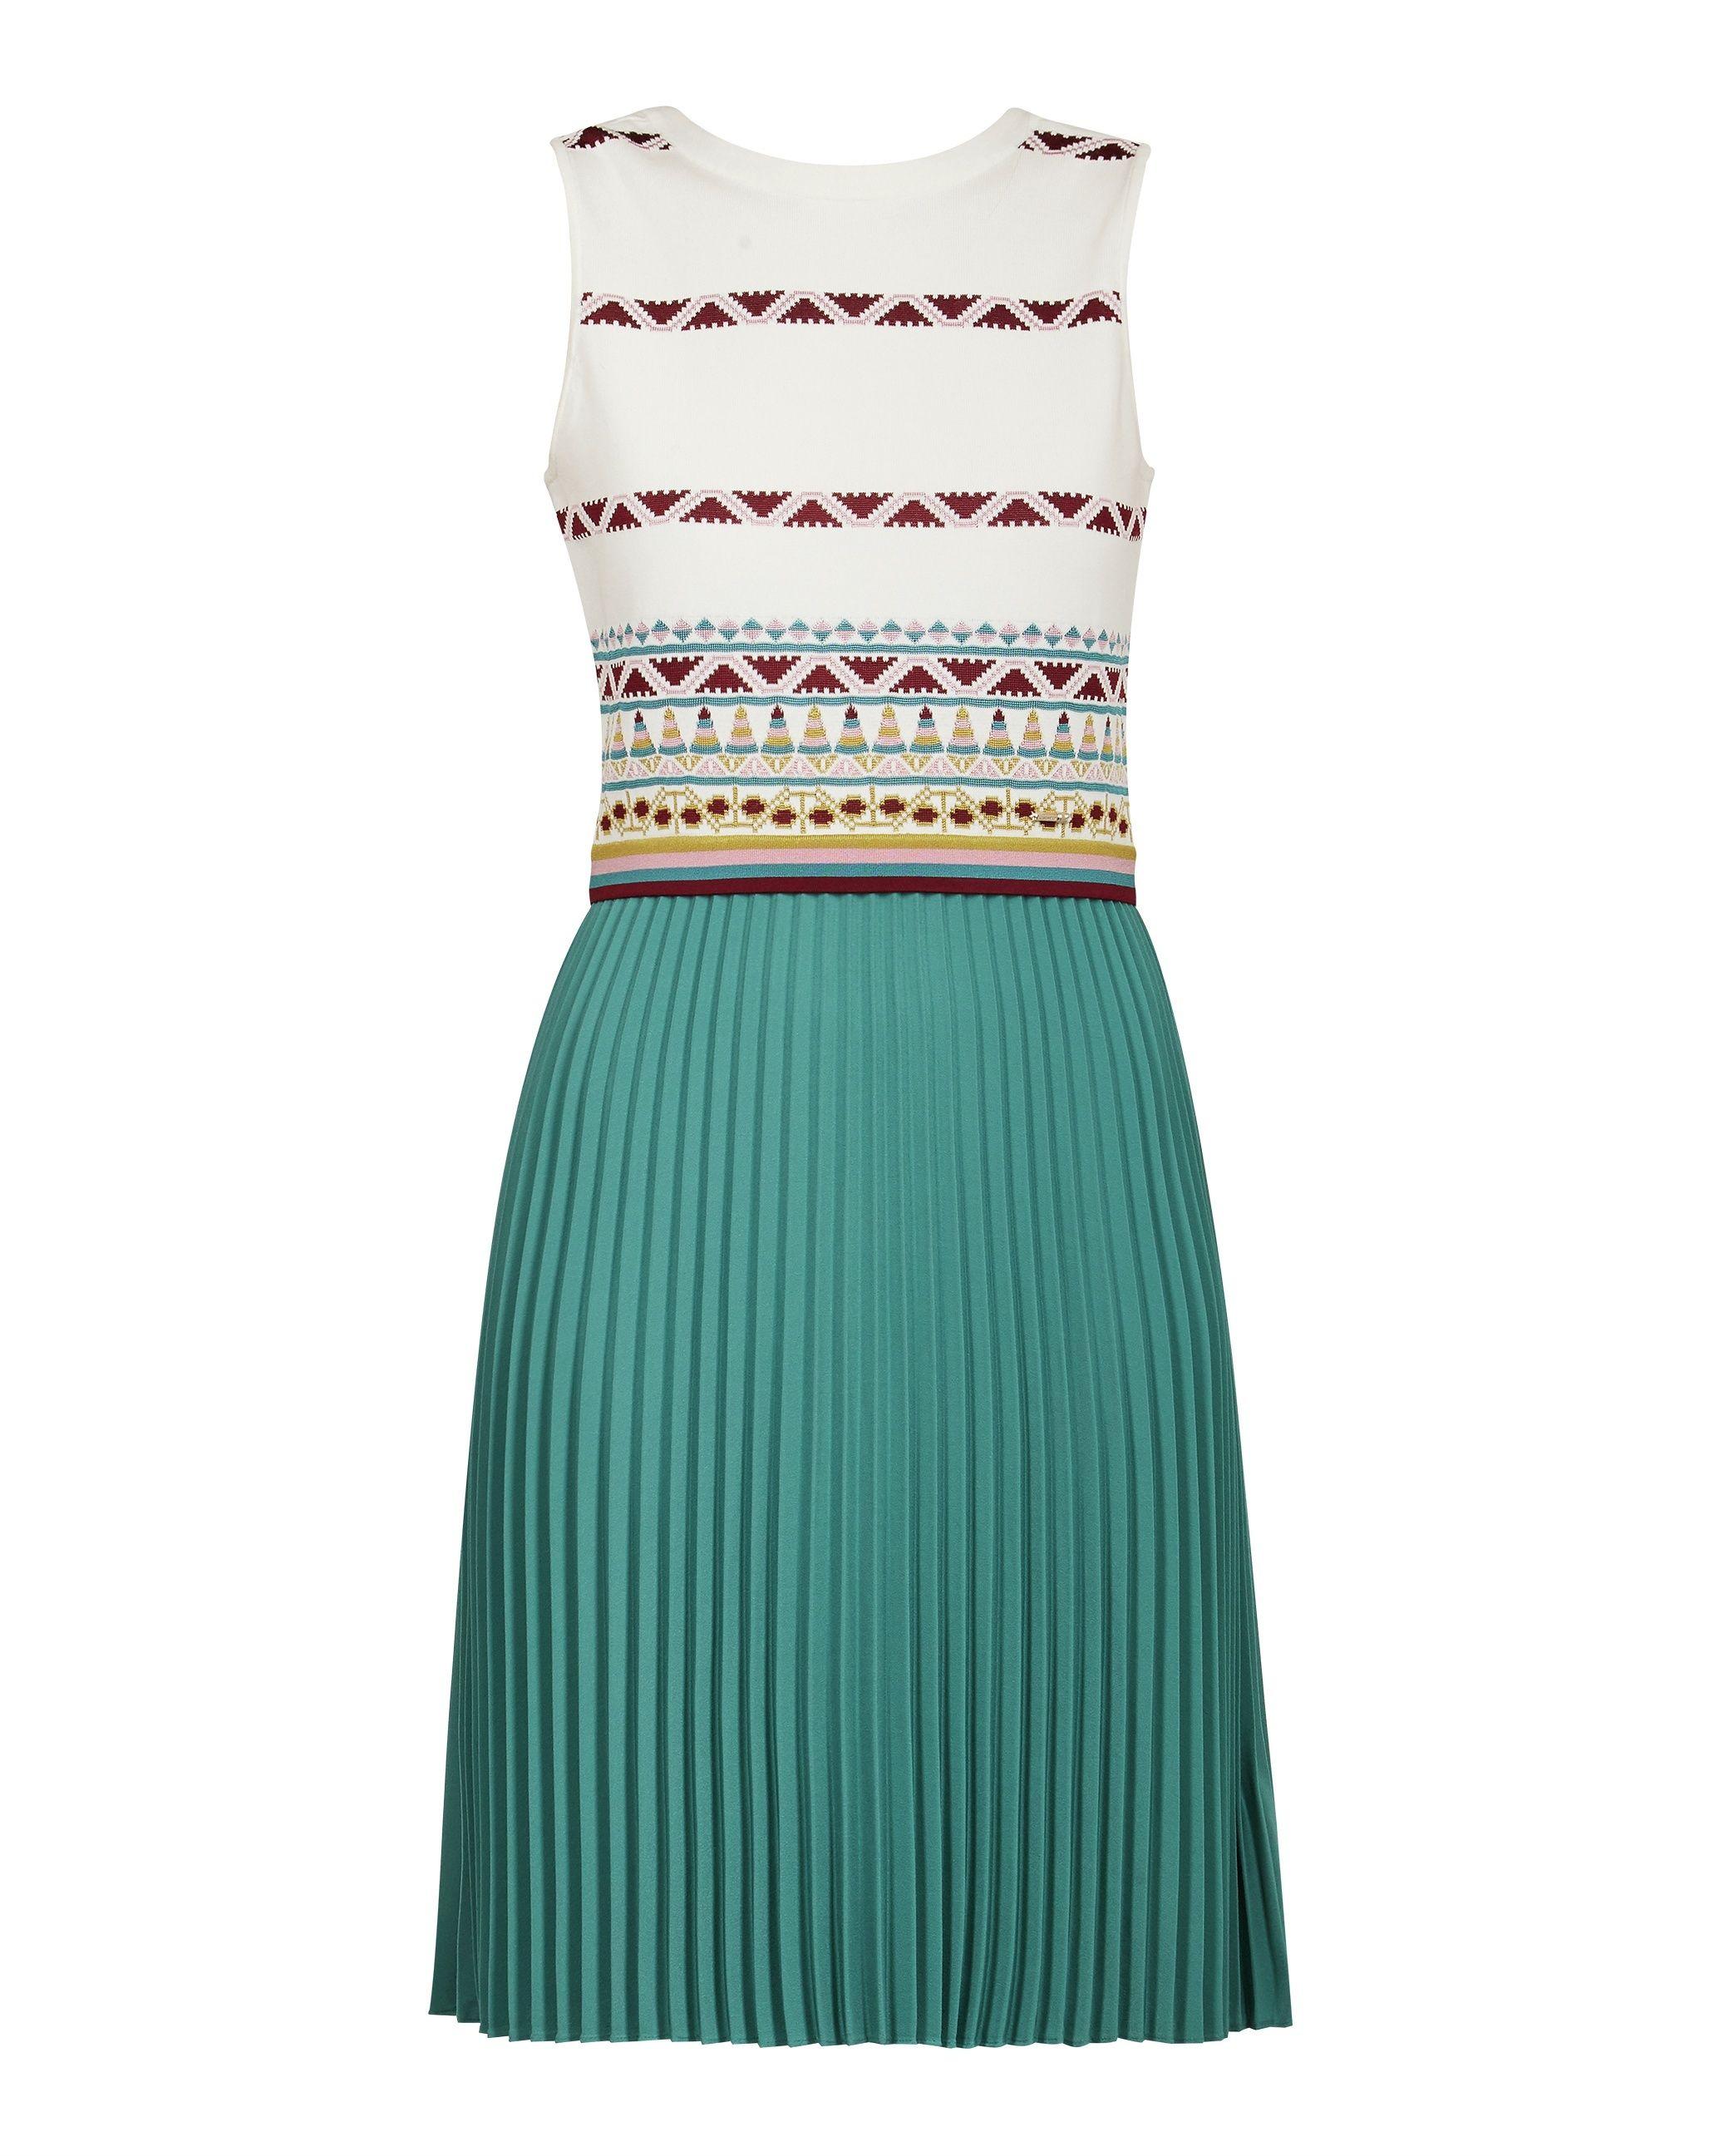 Ted Baker Zannan Cbn Knit Top Woven Pleat Skirt Dress, Ivory